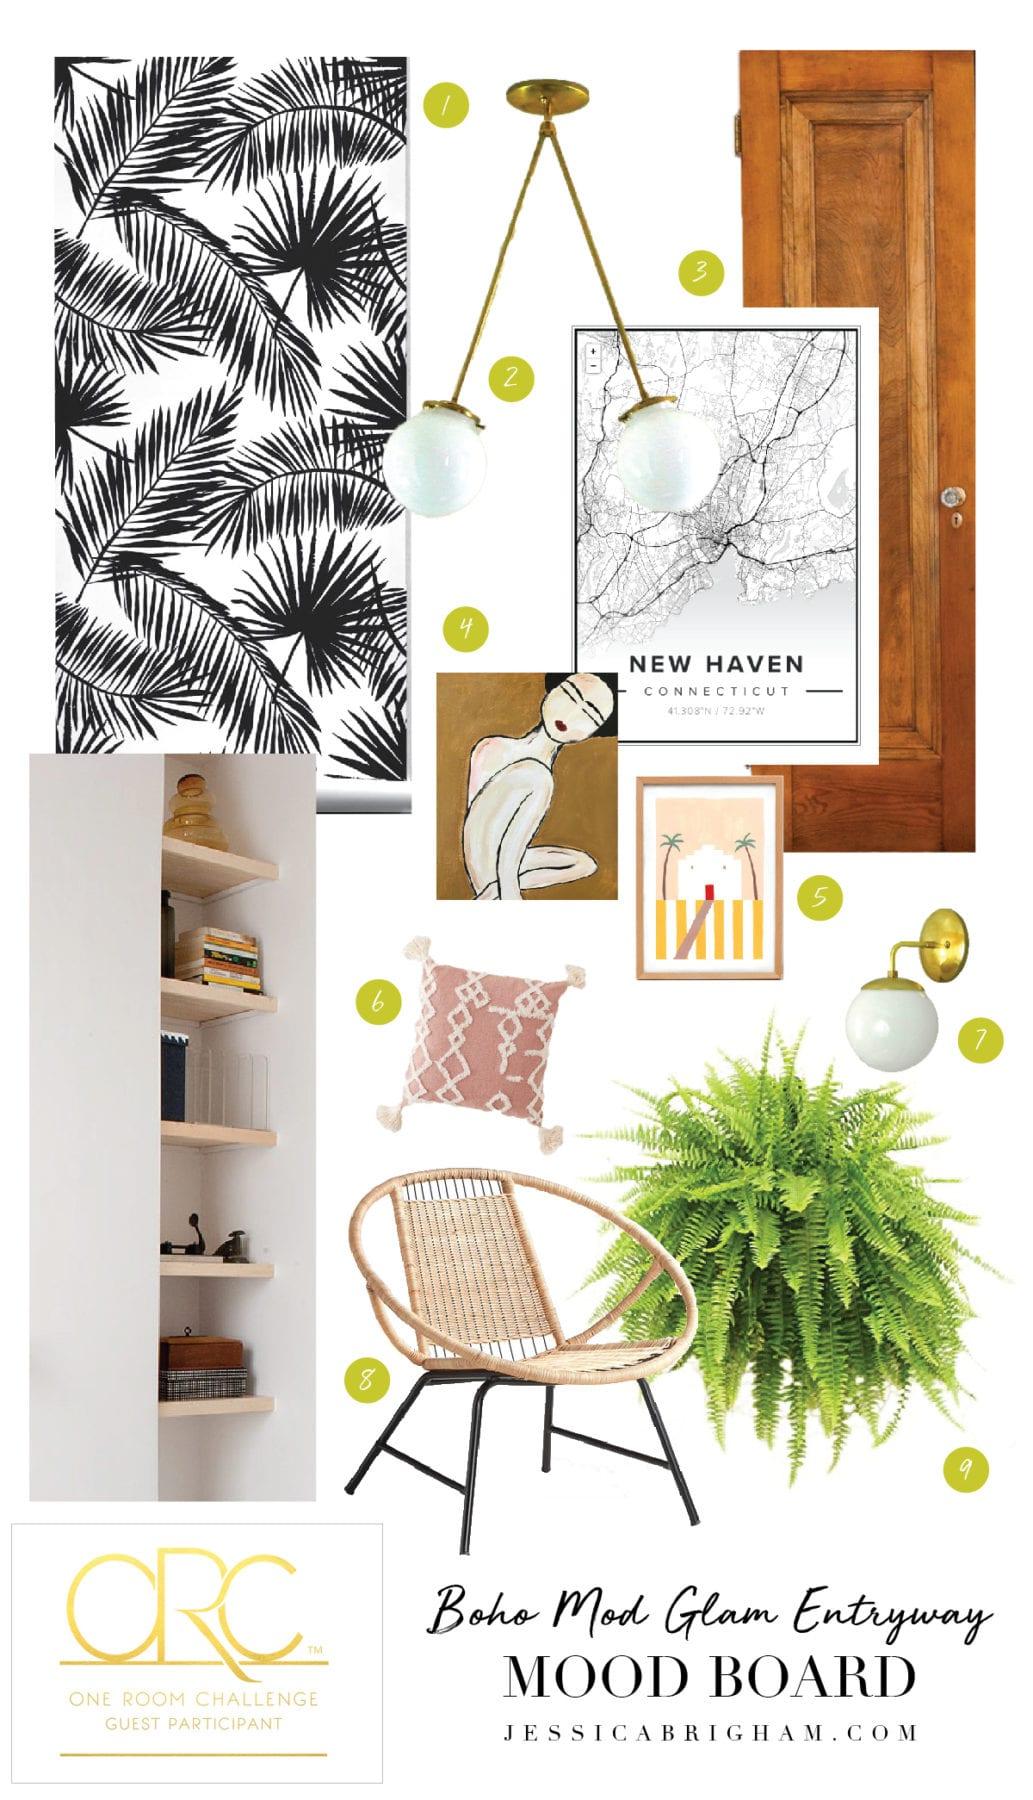 One Room Challenge | Boho Mod Glam Entryway | Week One | Jessica Brigham | Magazine Ready for Life